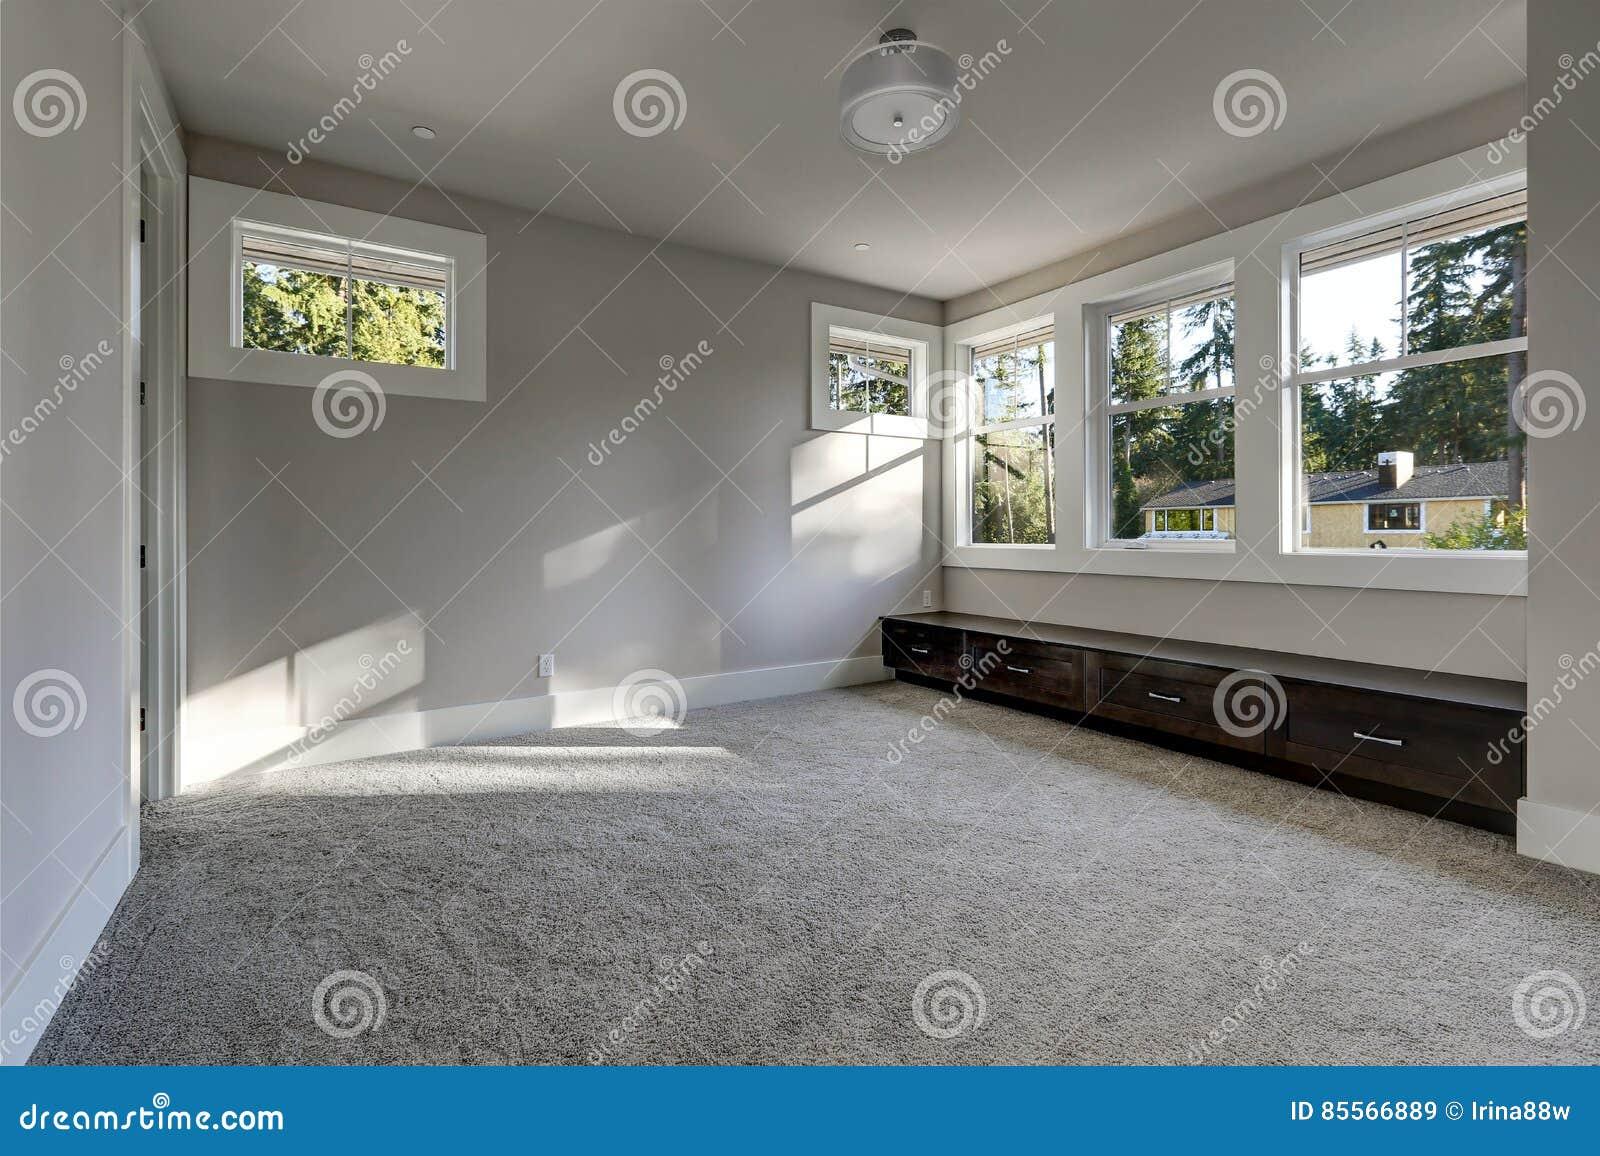 Leerer Rauminnenraum Mit Grauen Wänden Malt Farbe Stockbild - Bild ...